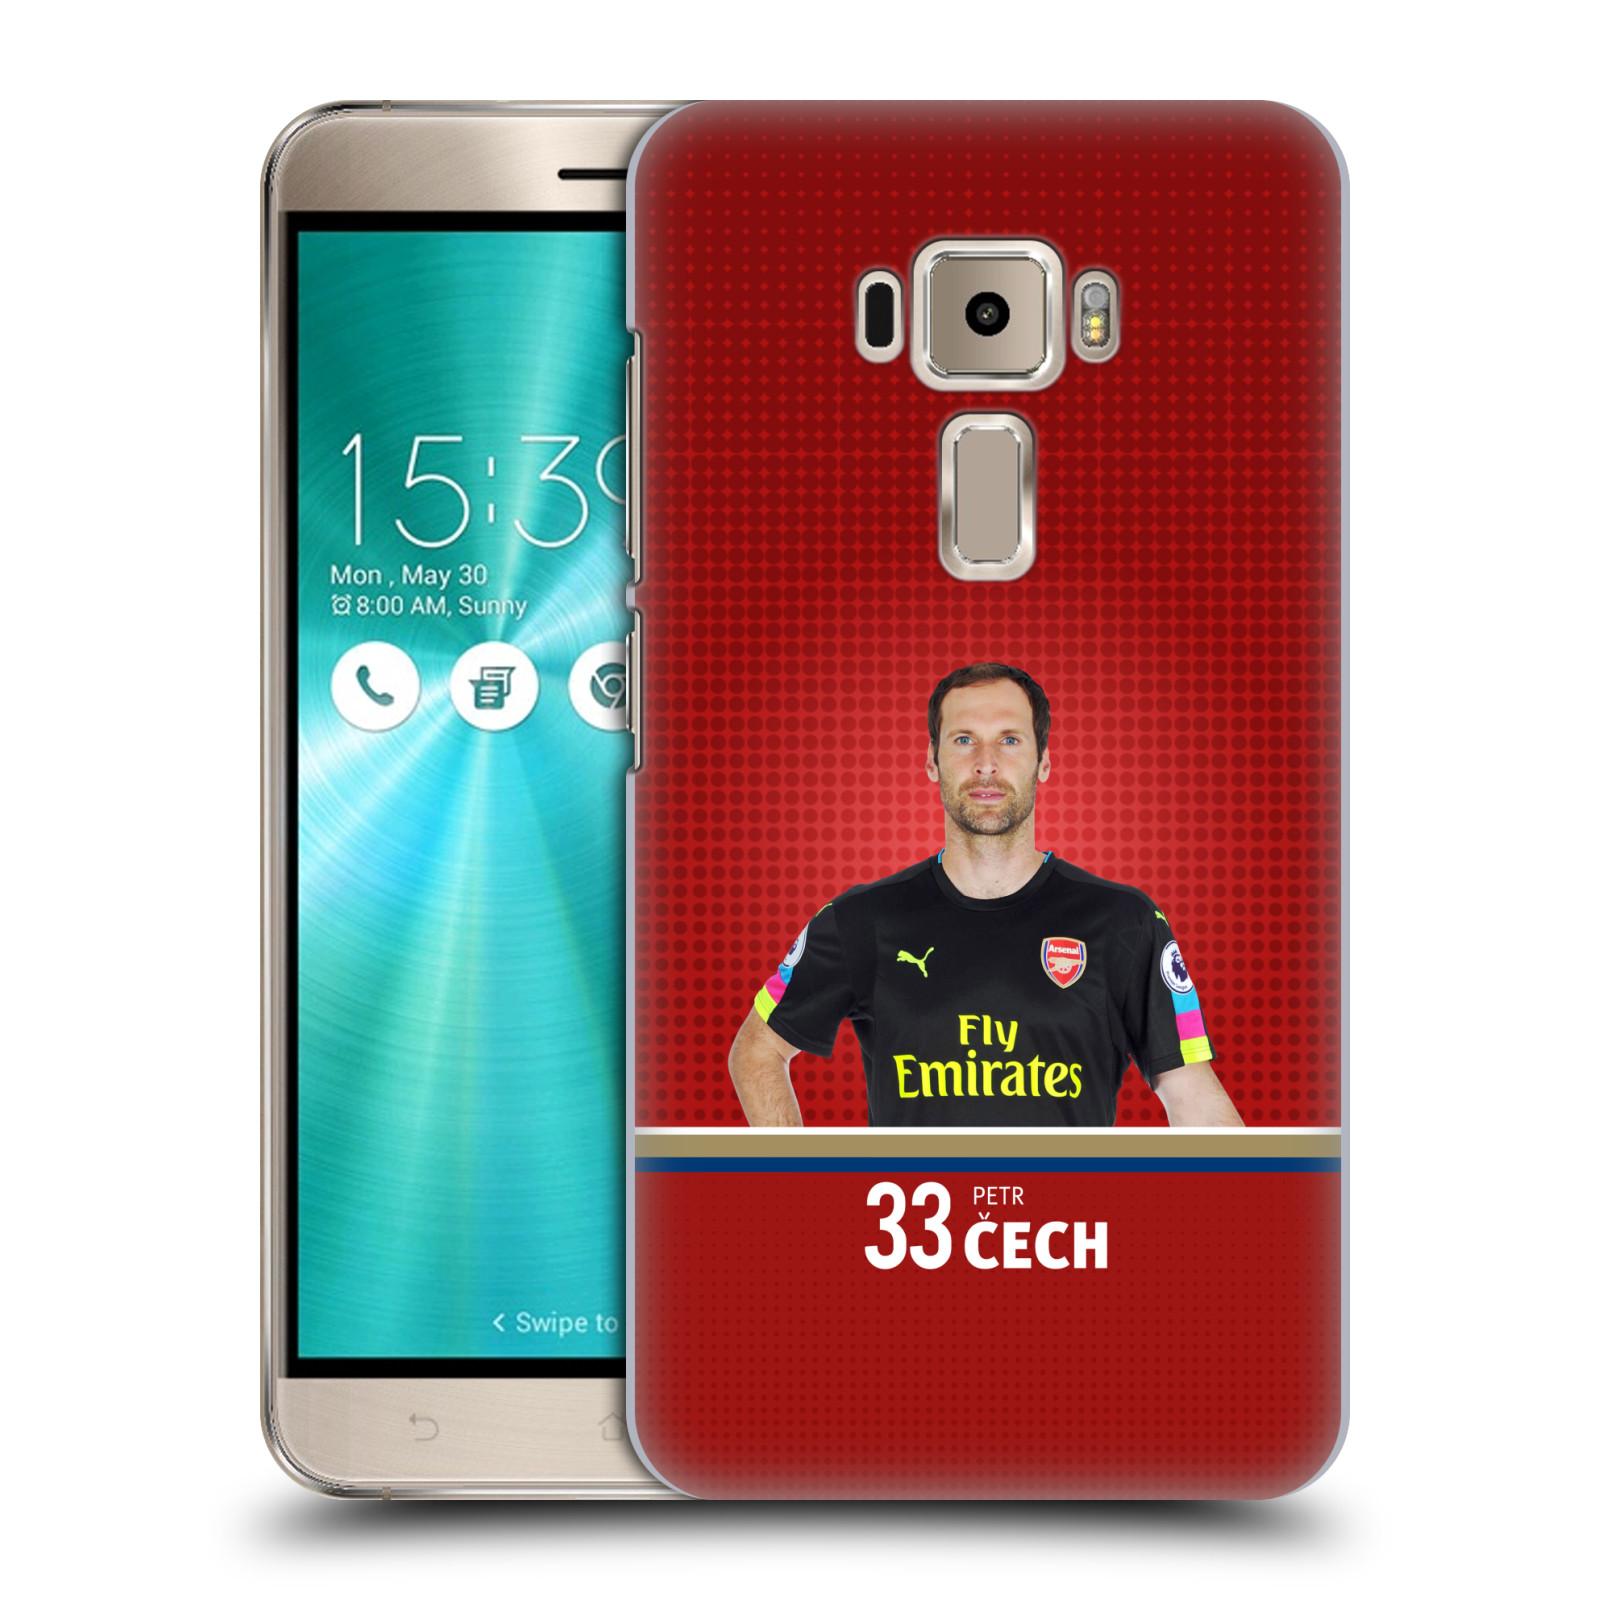 Plastové pouzdro na mobil Asus ZenFone 3 ZE520KL - Head Case - Arsenal FC - Petr Čech